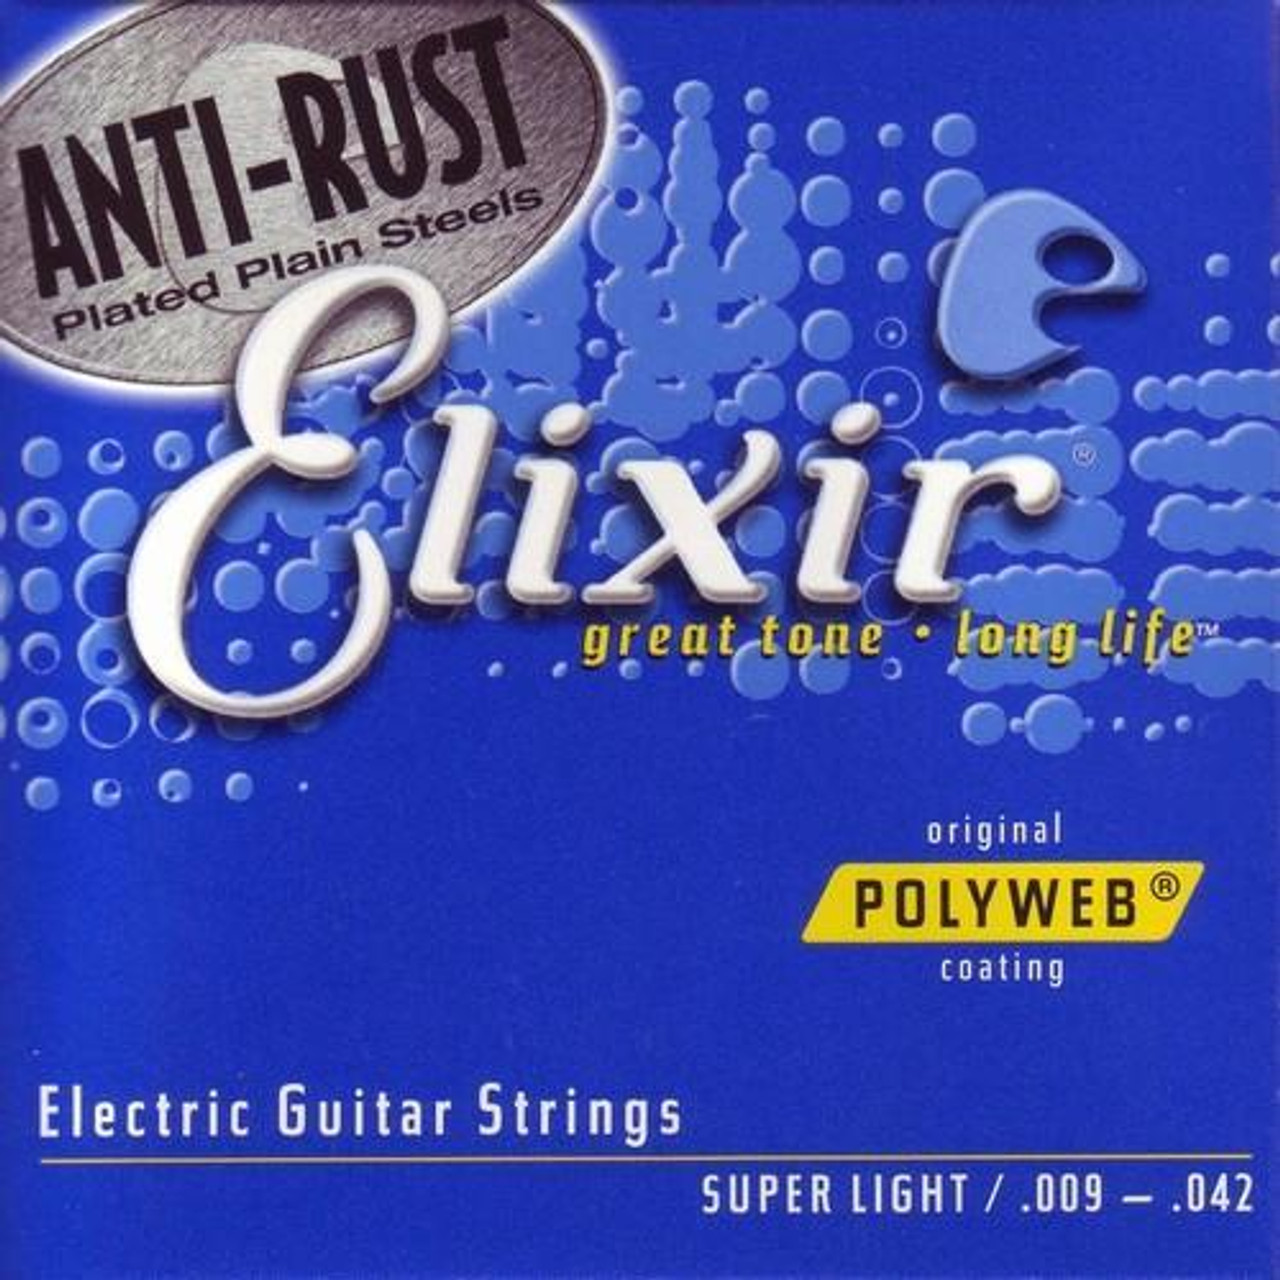 Elixir Polyweb Electric Guitar Strings